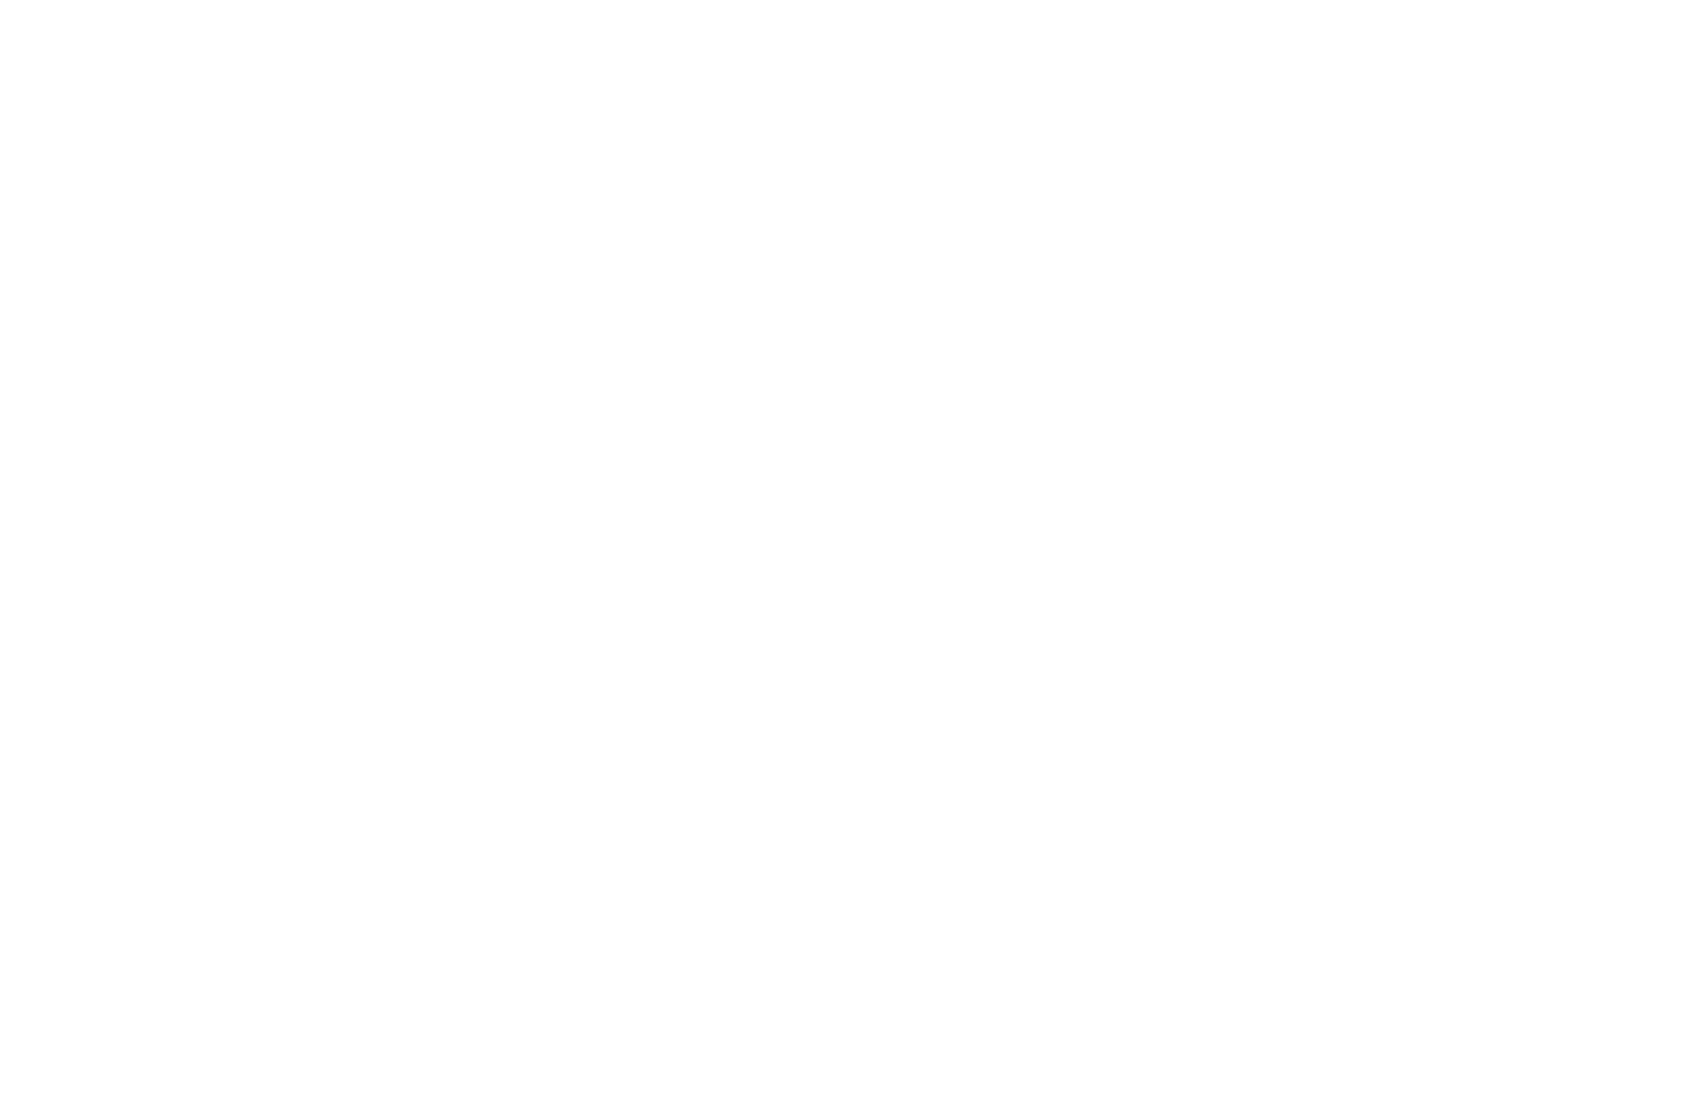 Cronfa Gymunedol / Community Fund Logo